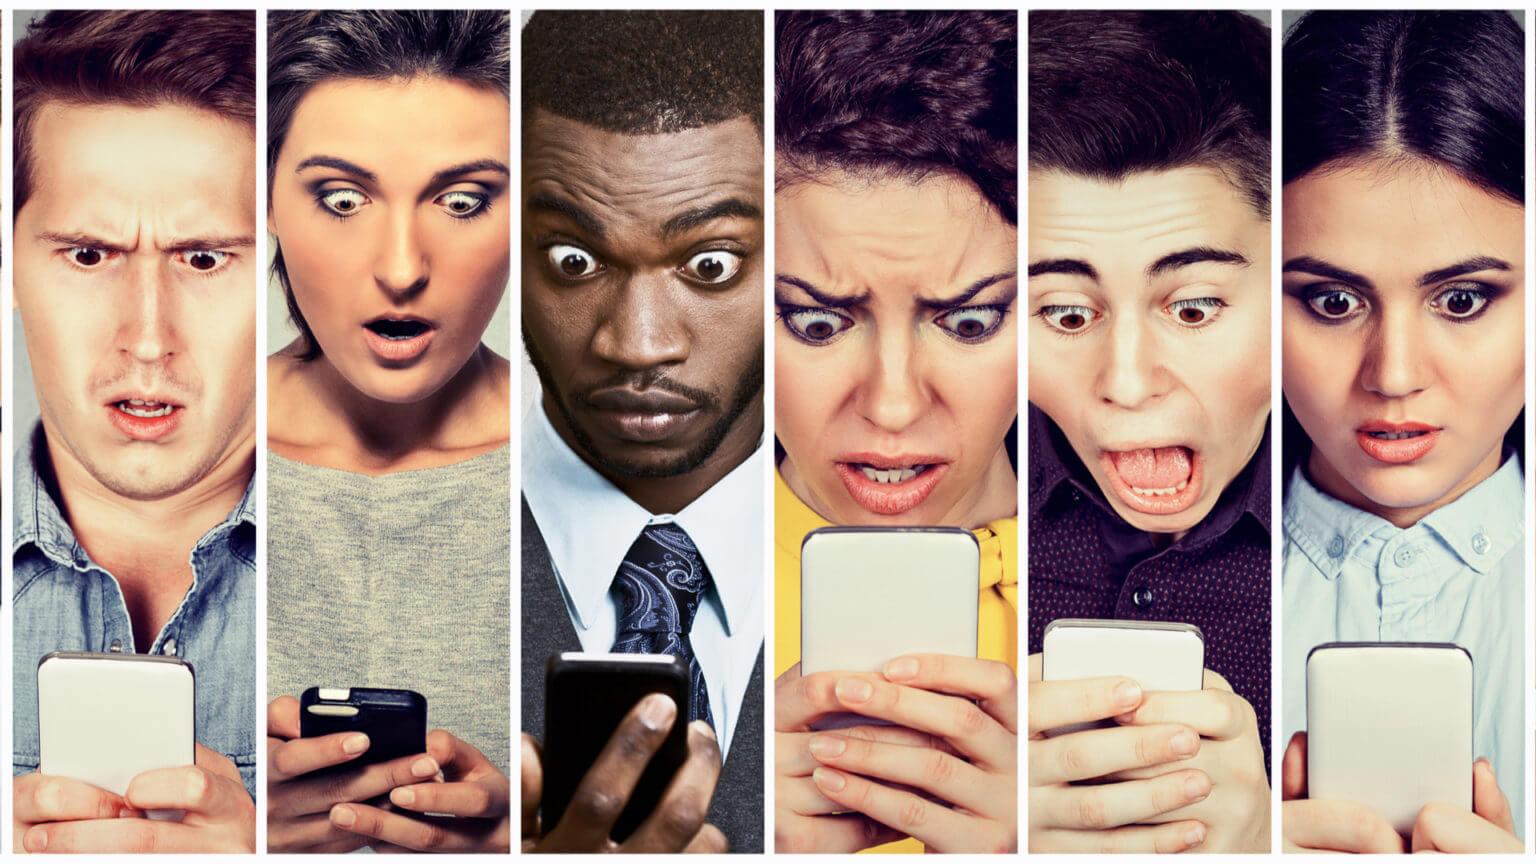 Is personalization, ID resolution worth risking customer trust?